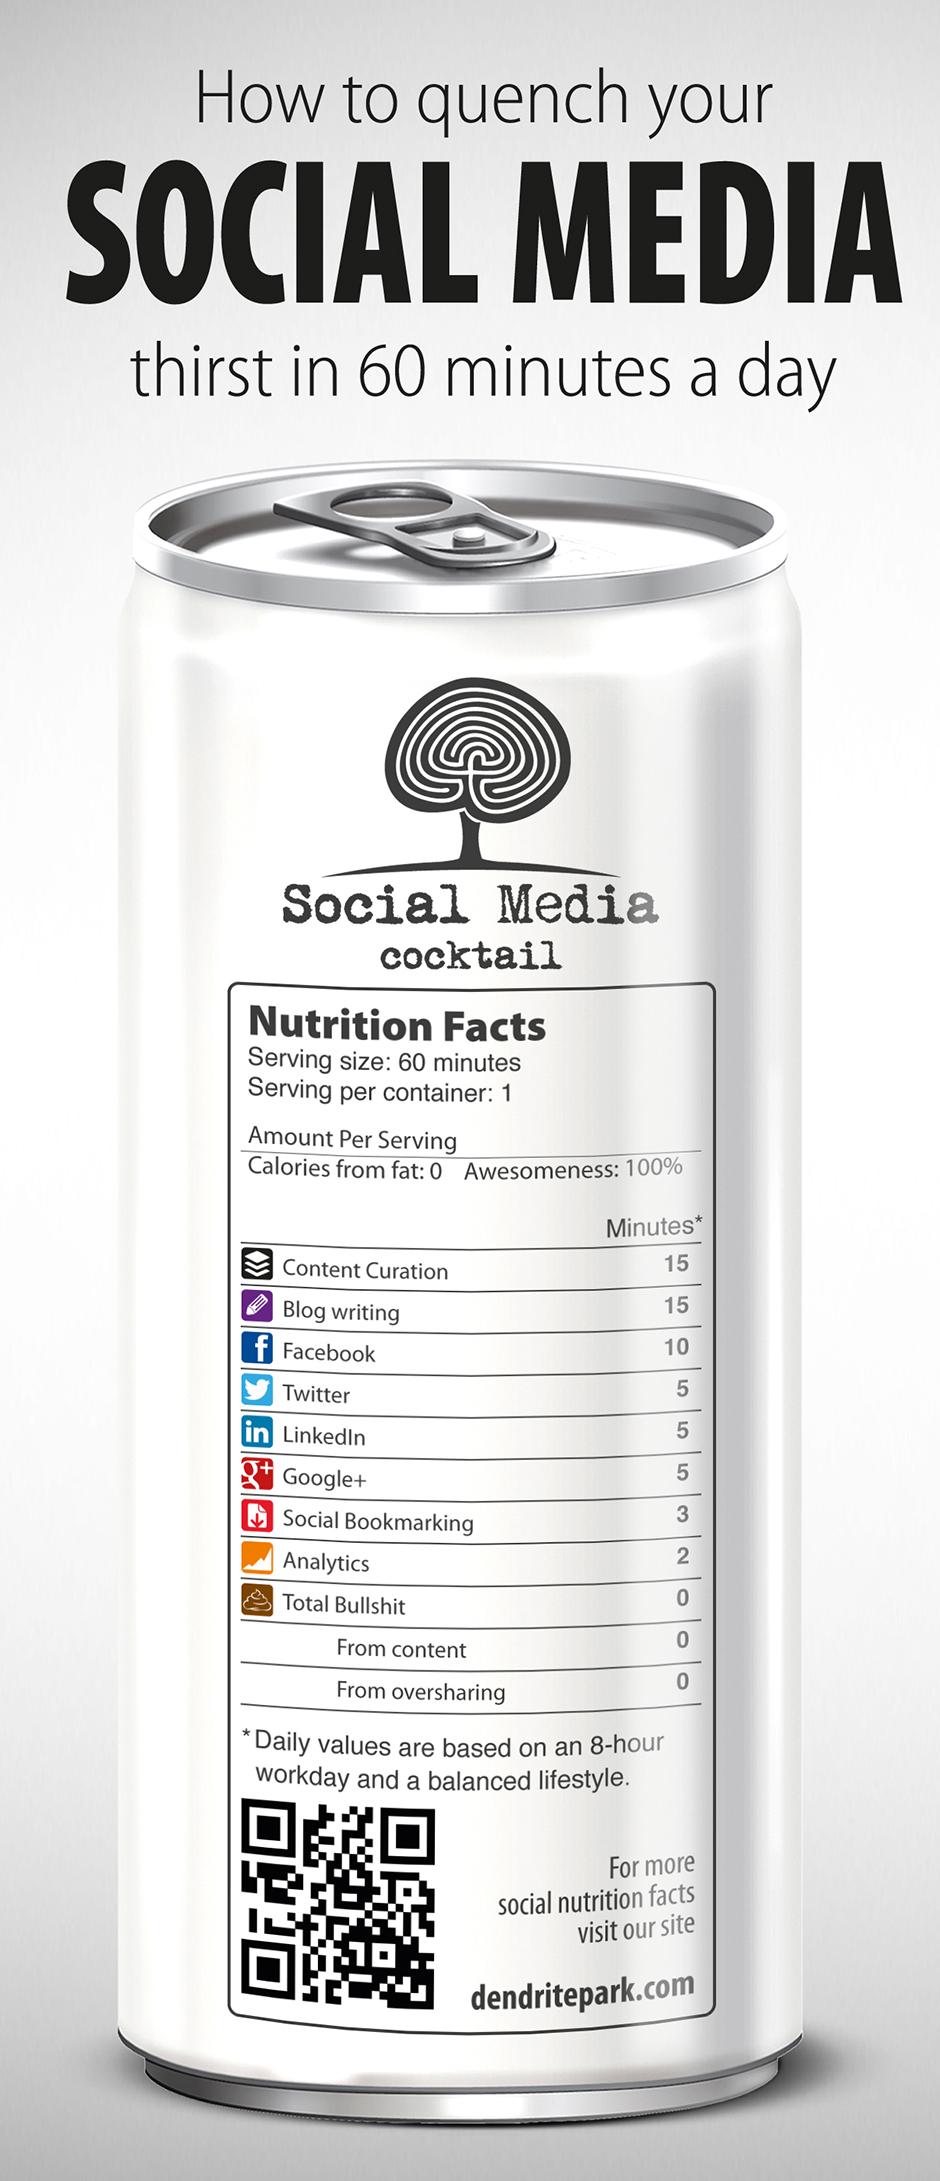 Social Media Cocktail